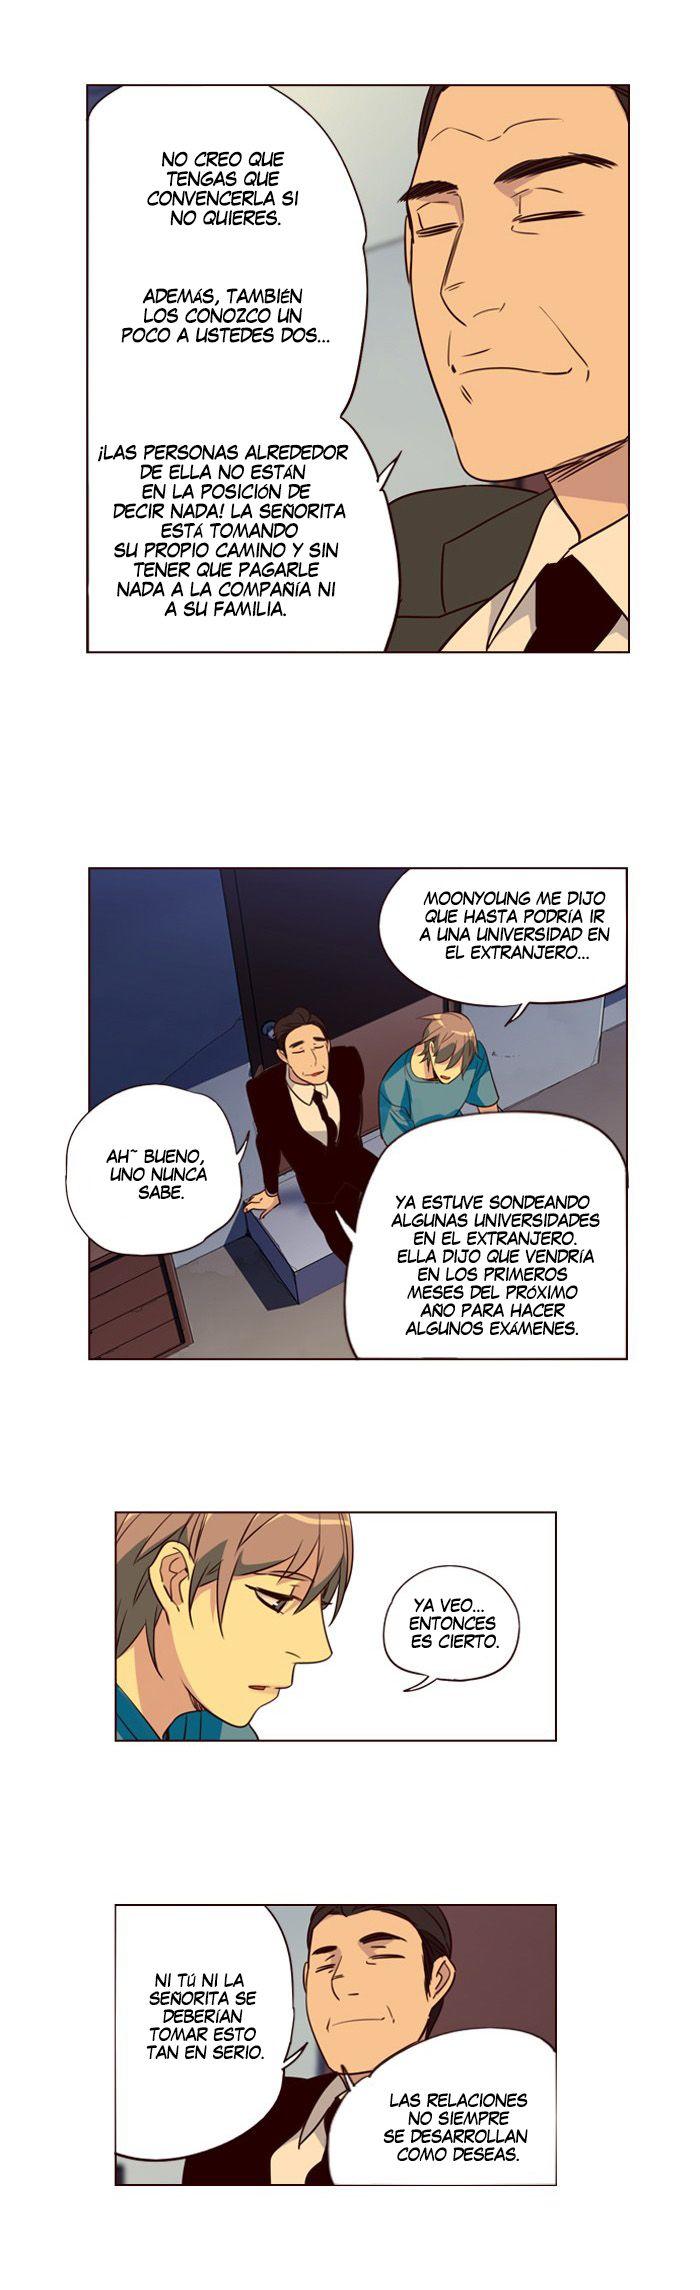 http://c5.ninemanga.com/es_manga/32/416/485306/327d369a1675bdfdfaefd41d501b3fac.jpg Page 9